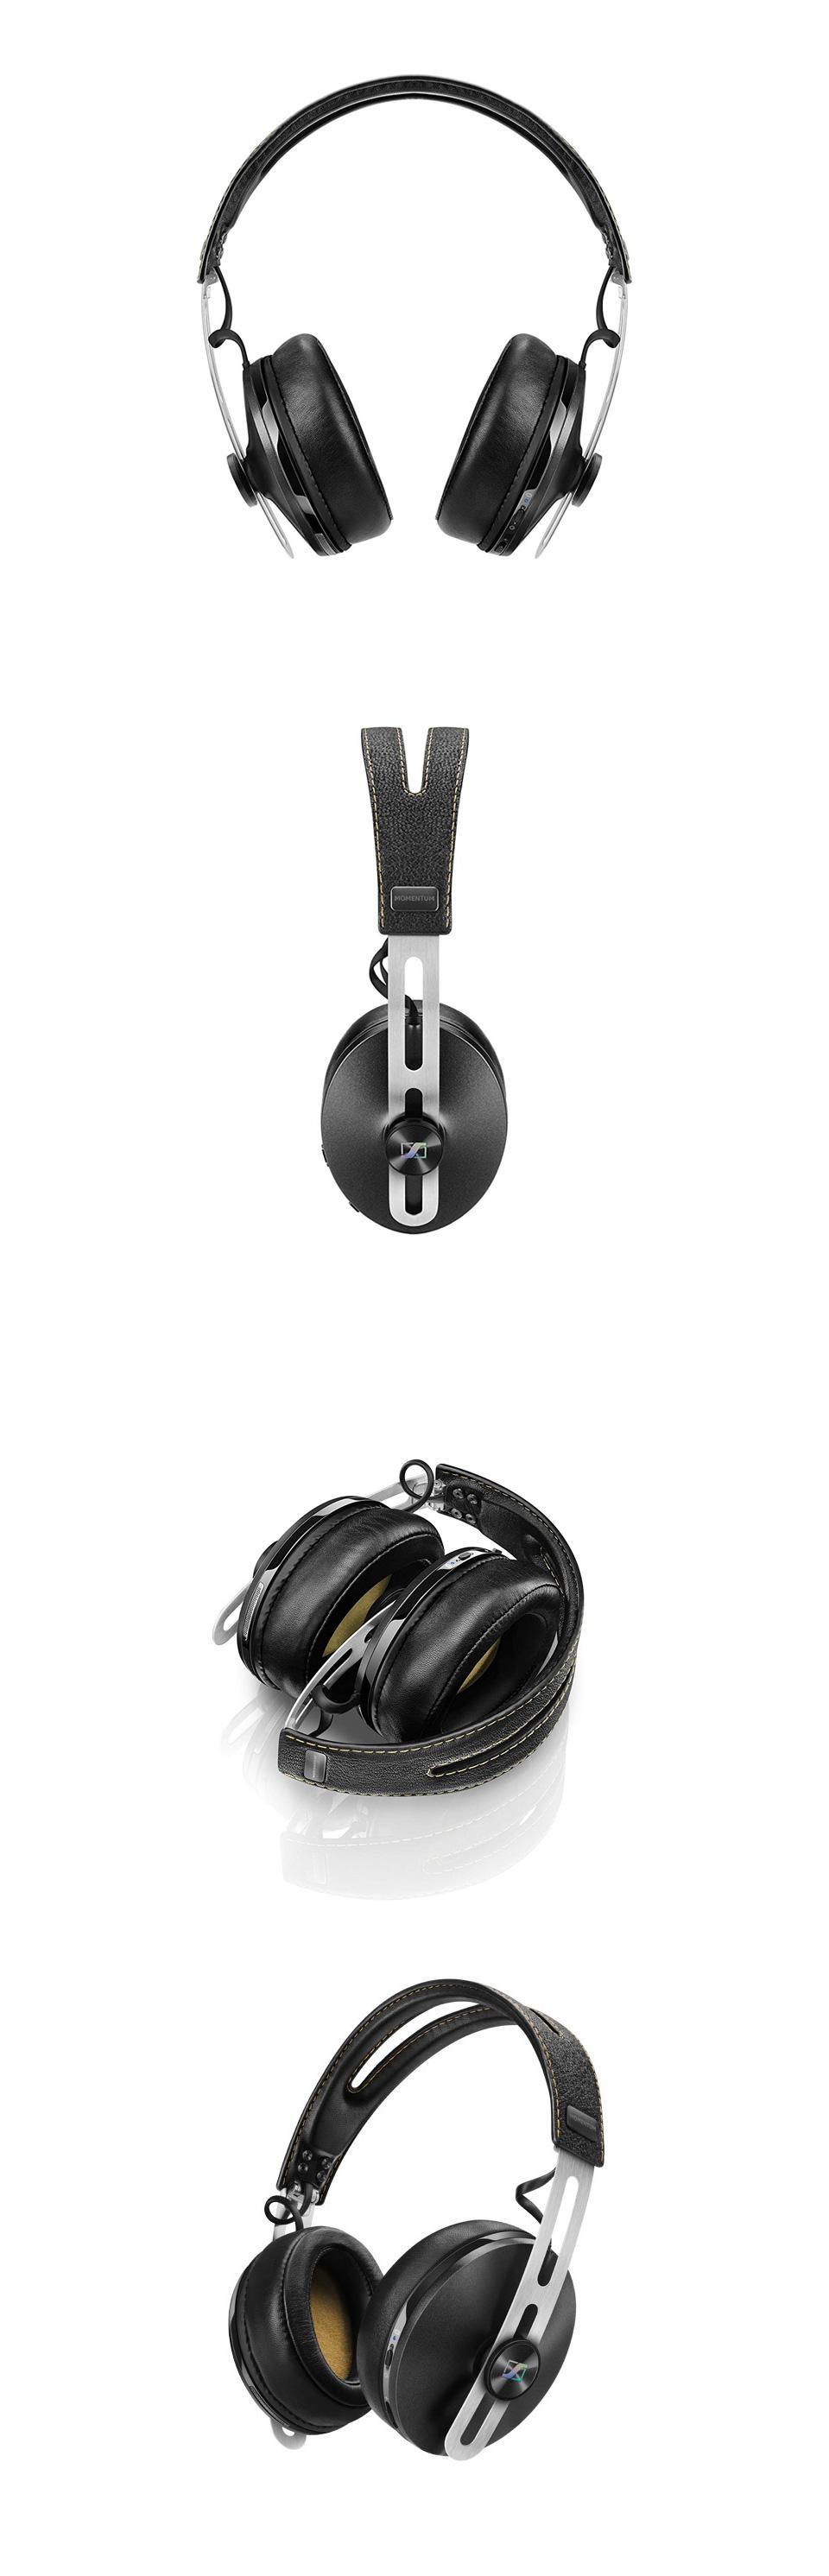 Sennheiser Momentum 2 Wireless Headphones product